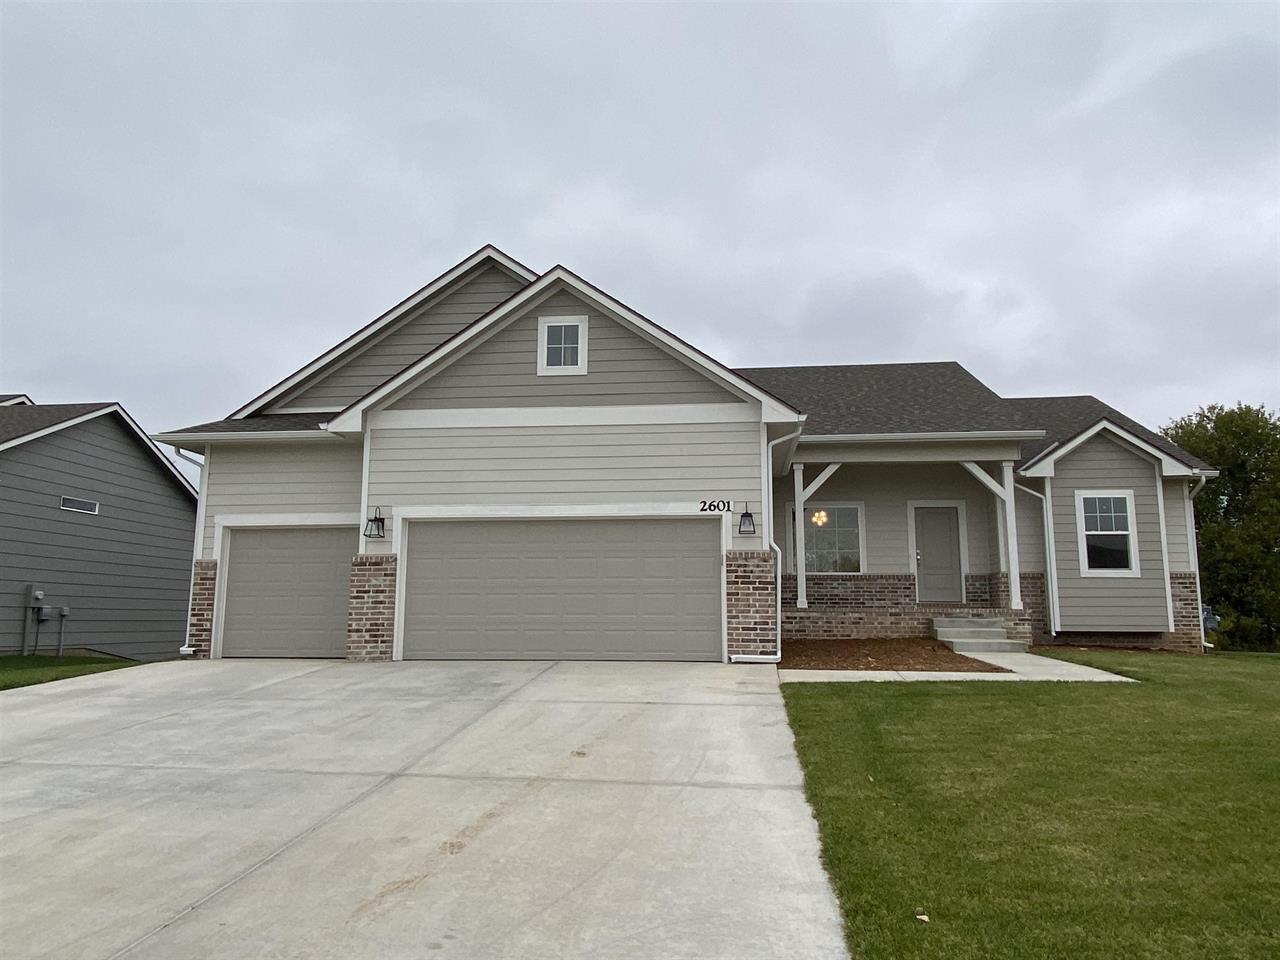 For Sale: 2601 S Lark Lane, Wichita KS